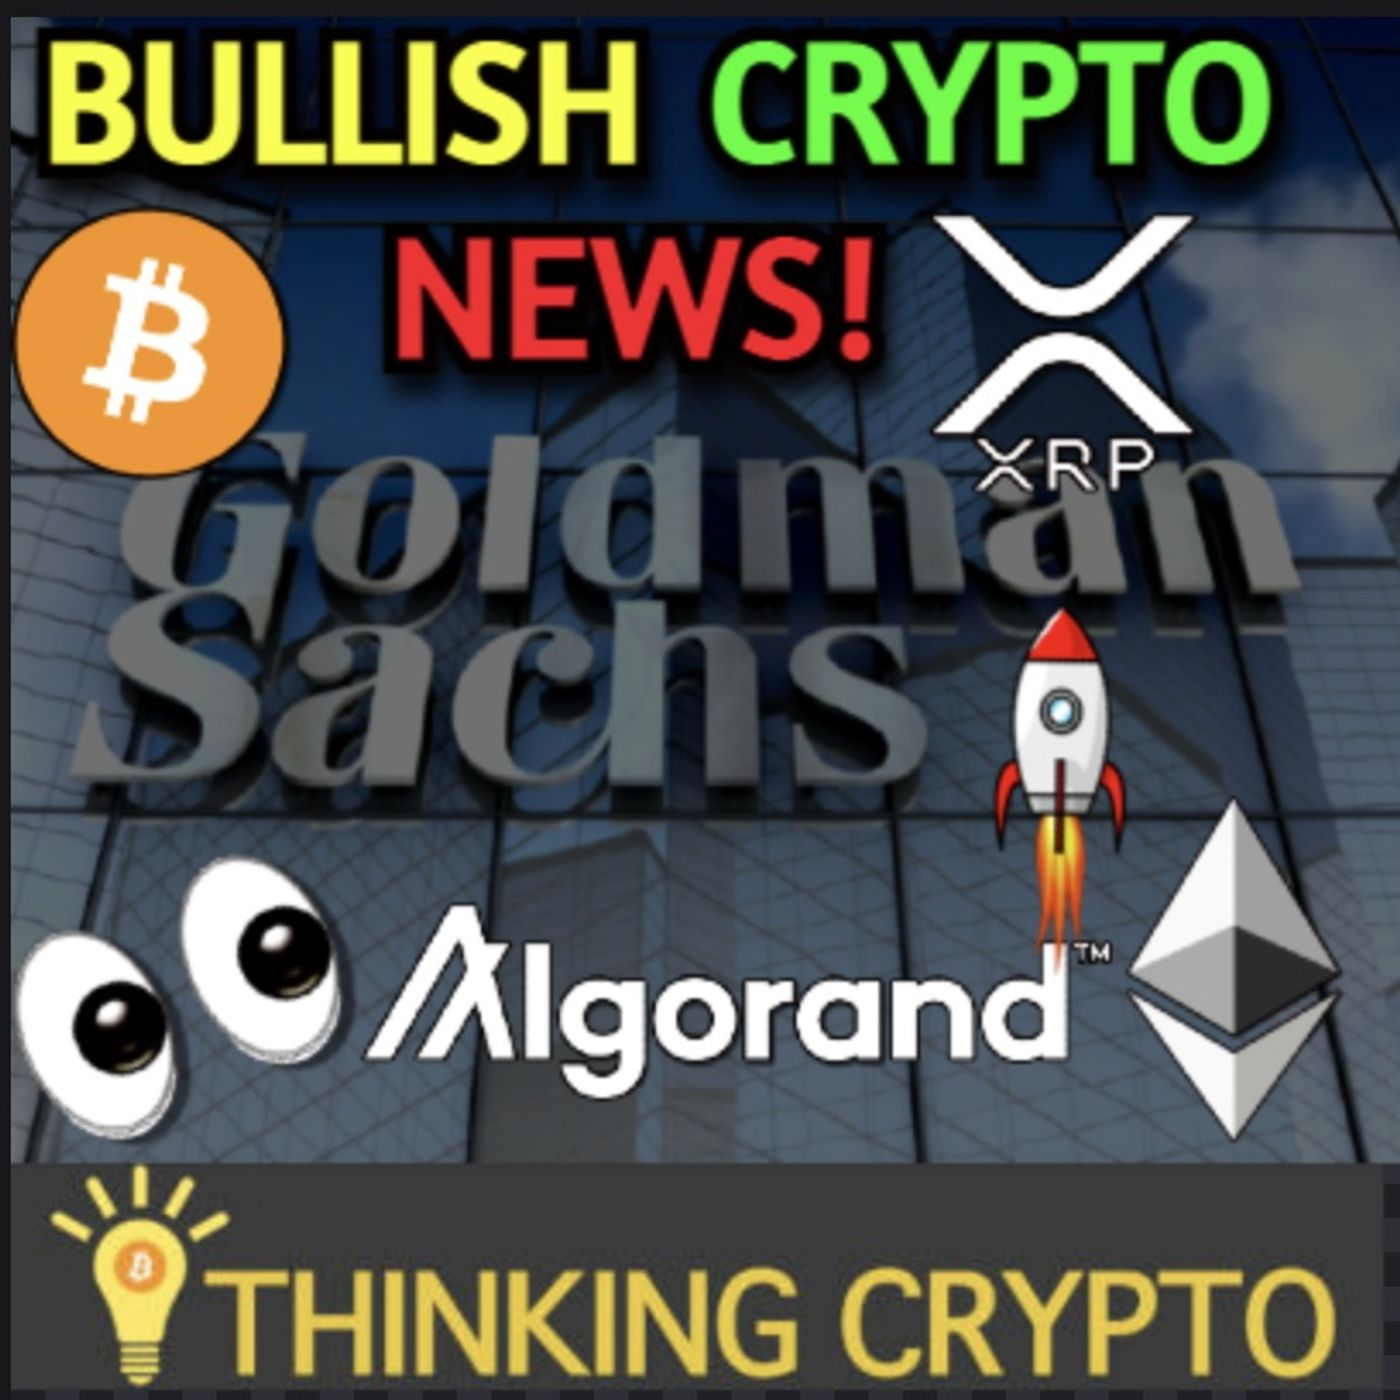 Bitcoin Next Target is $50K - Goldman Sachs Ethereum - Bitwise $70M Funding - GoldConnect BTC